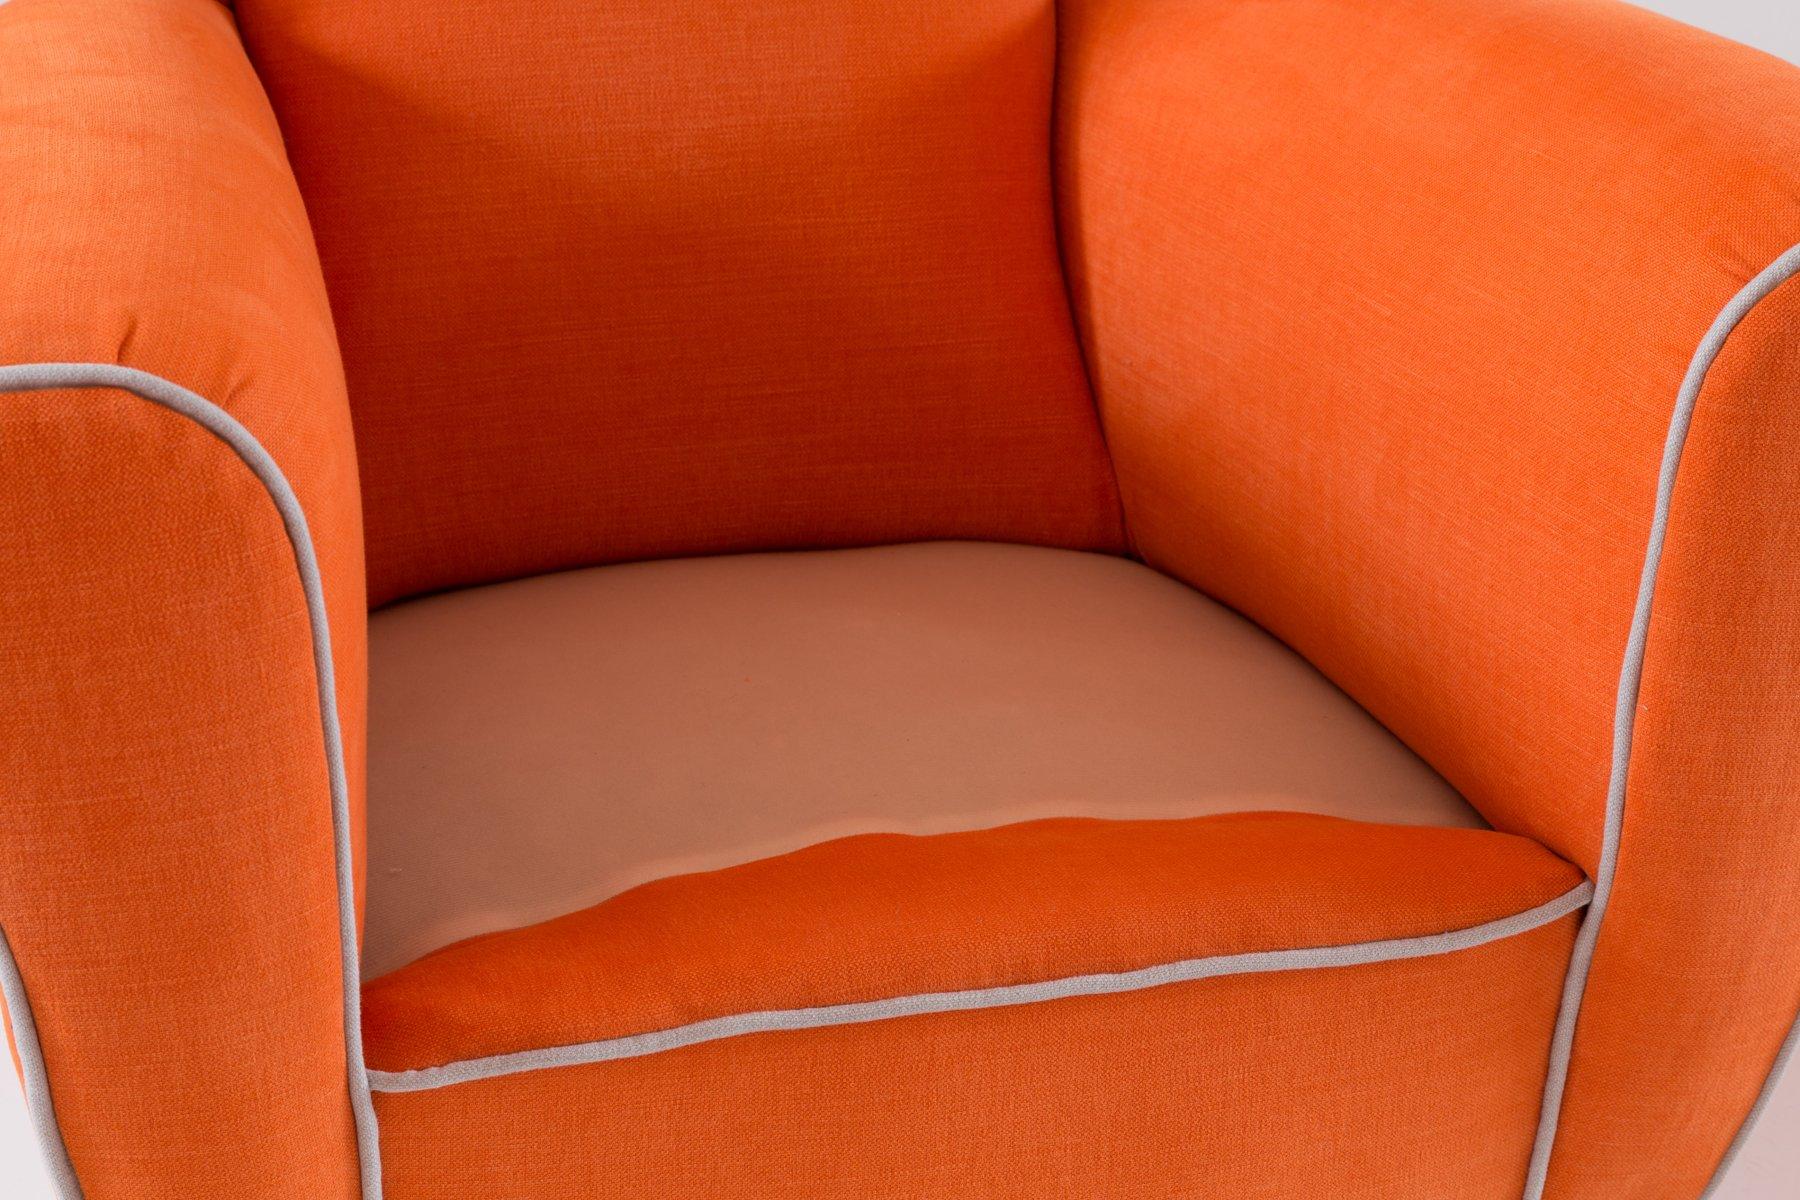 Orangefarbene ohrensessel von melchiorre bega 2er set bei for Ohrensessel 2er